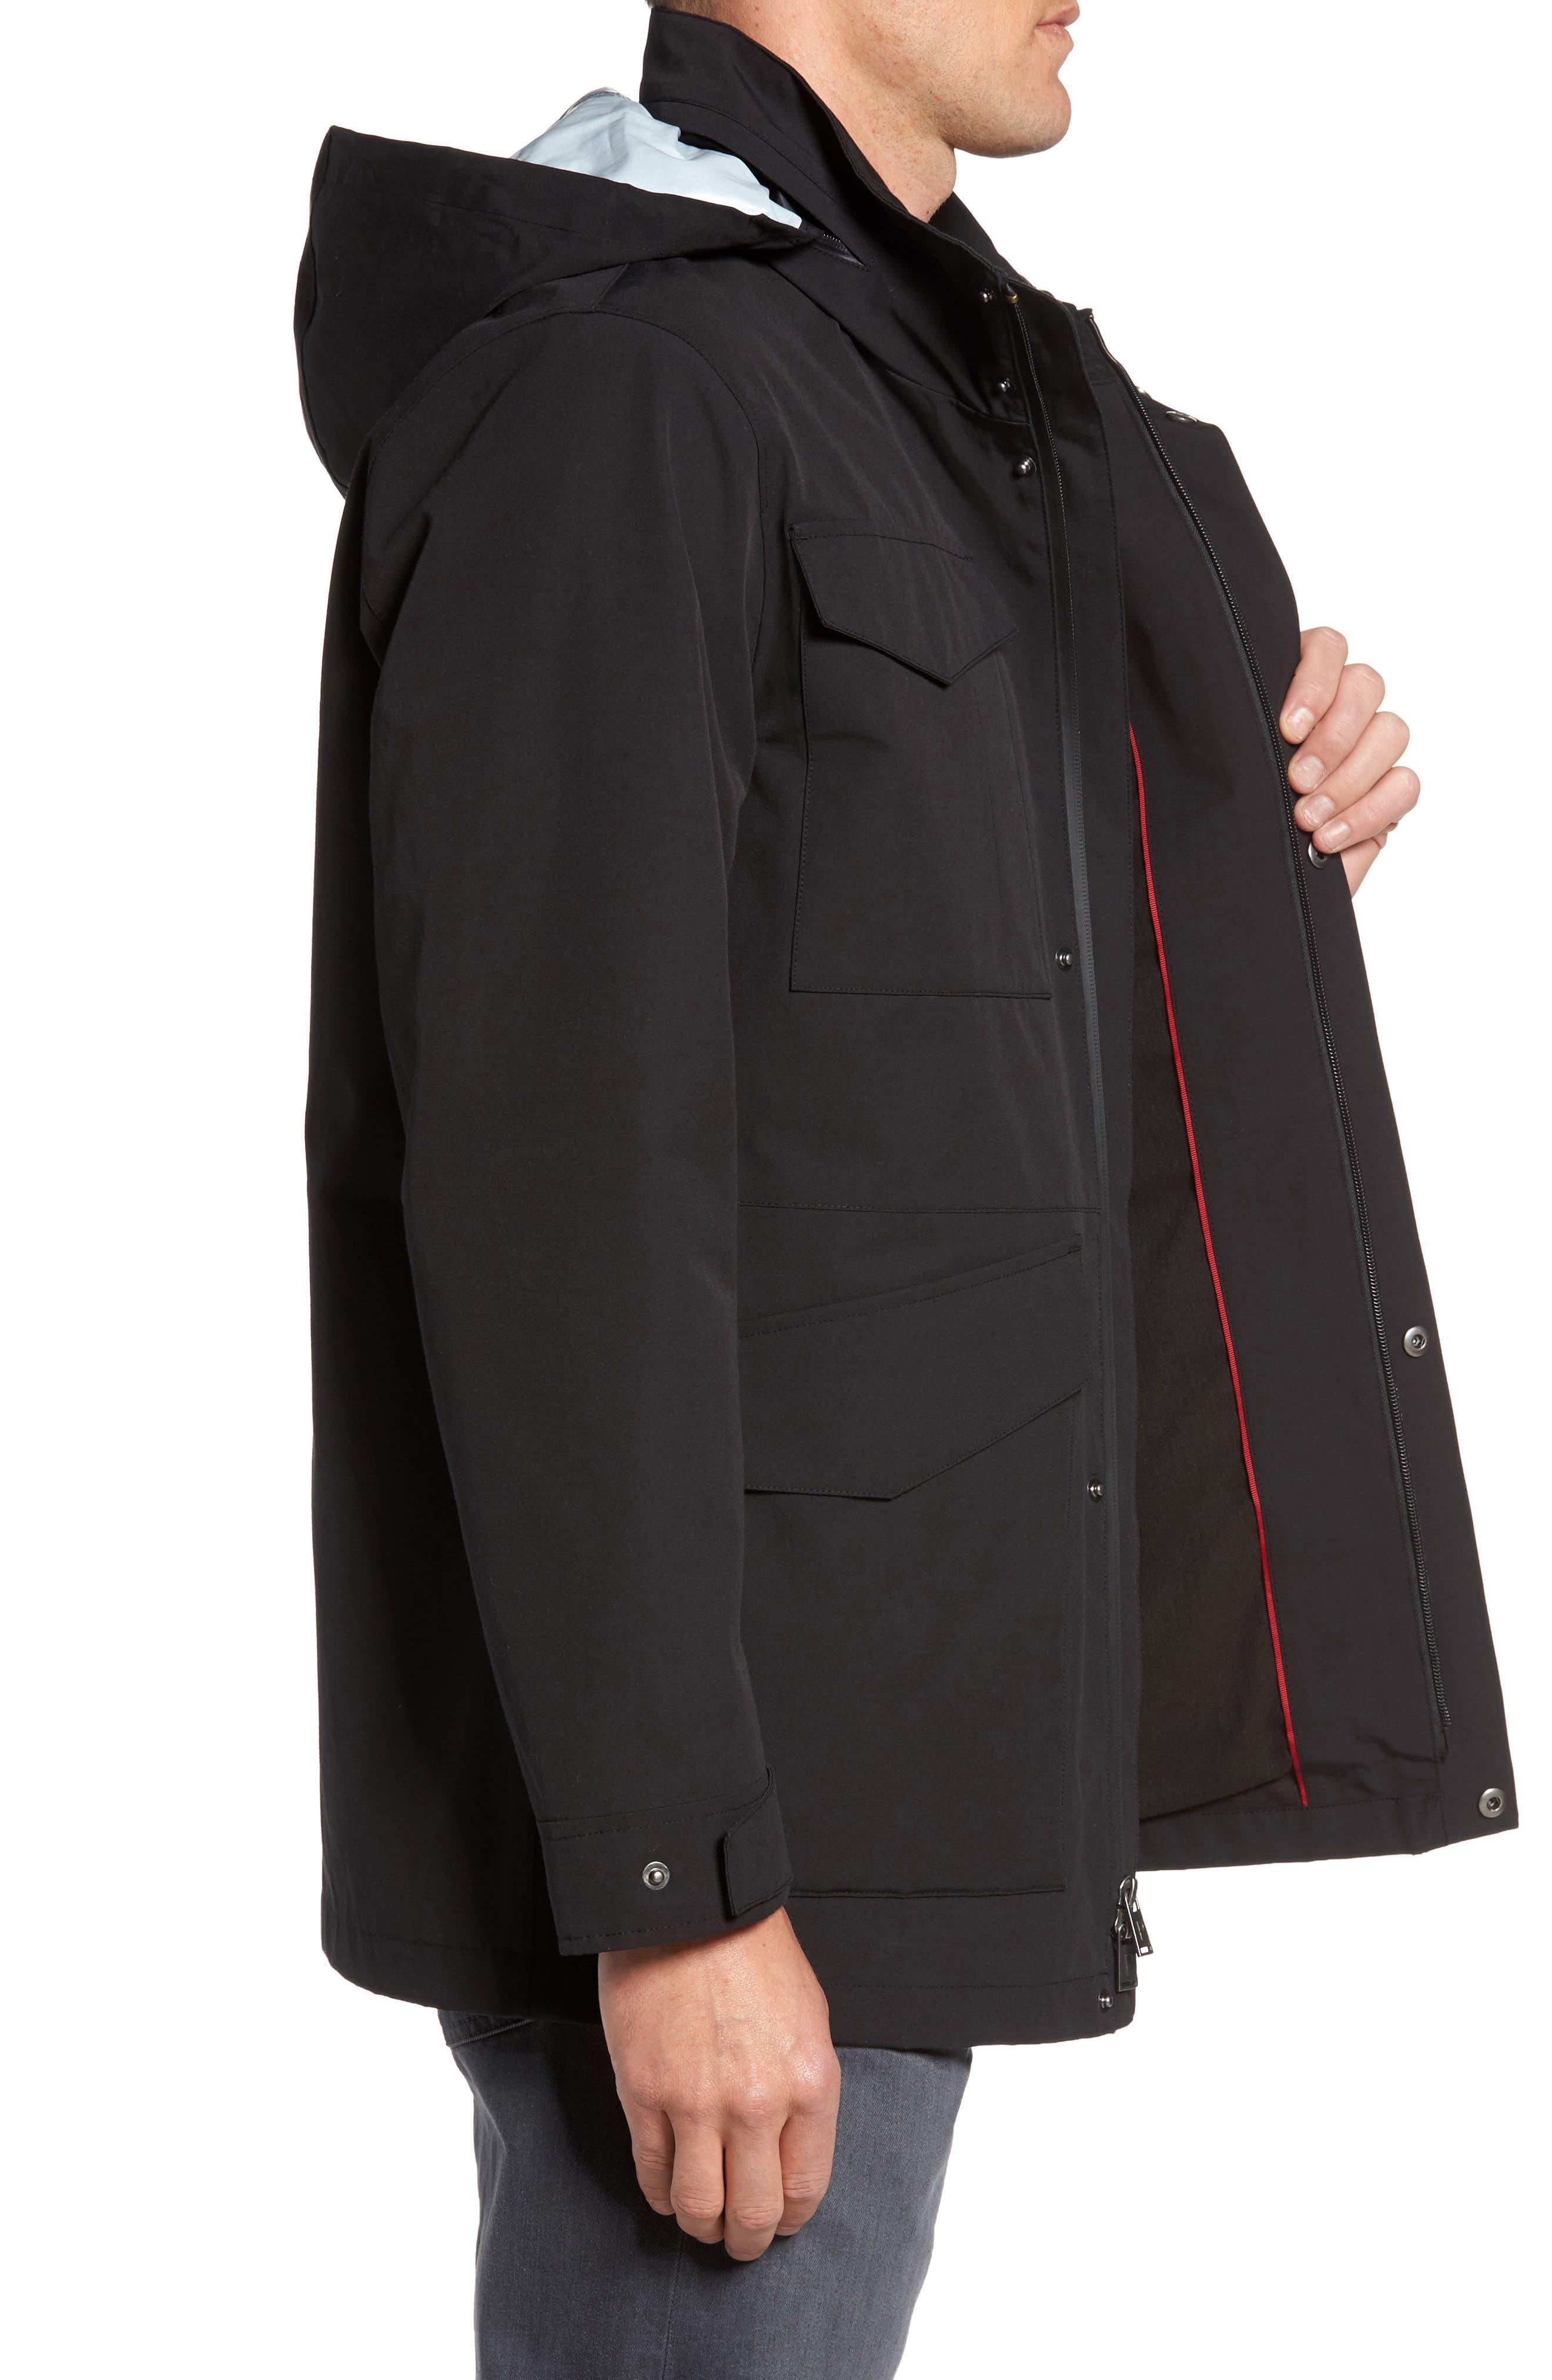 Clyde Hill Waterproof Field Jacket,                             Alternate thumbnail 3, color,                             Black